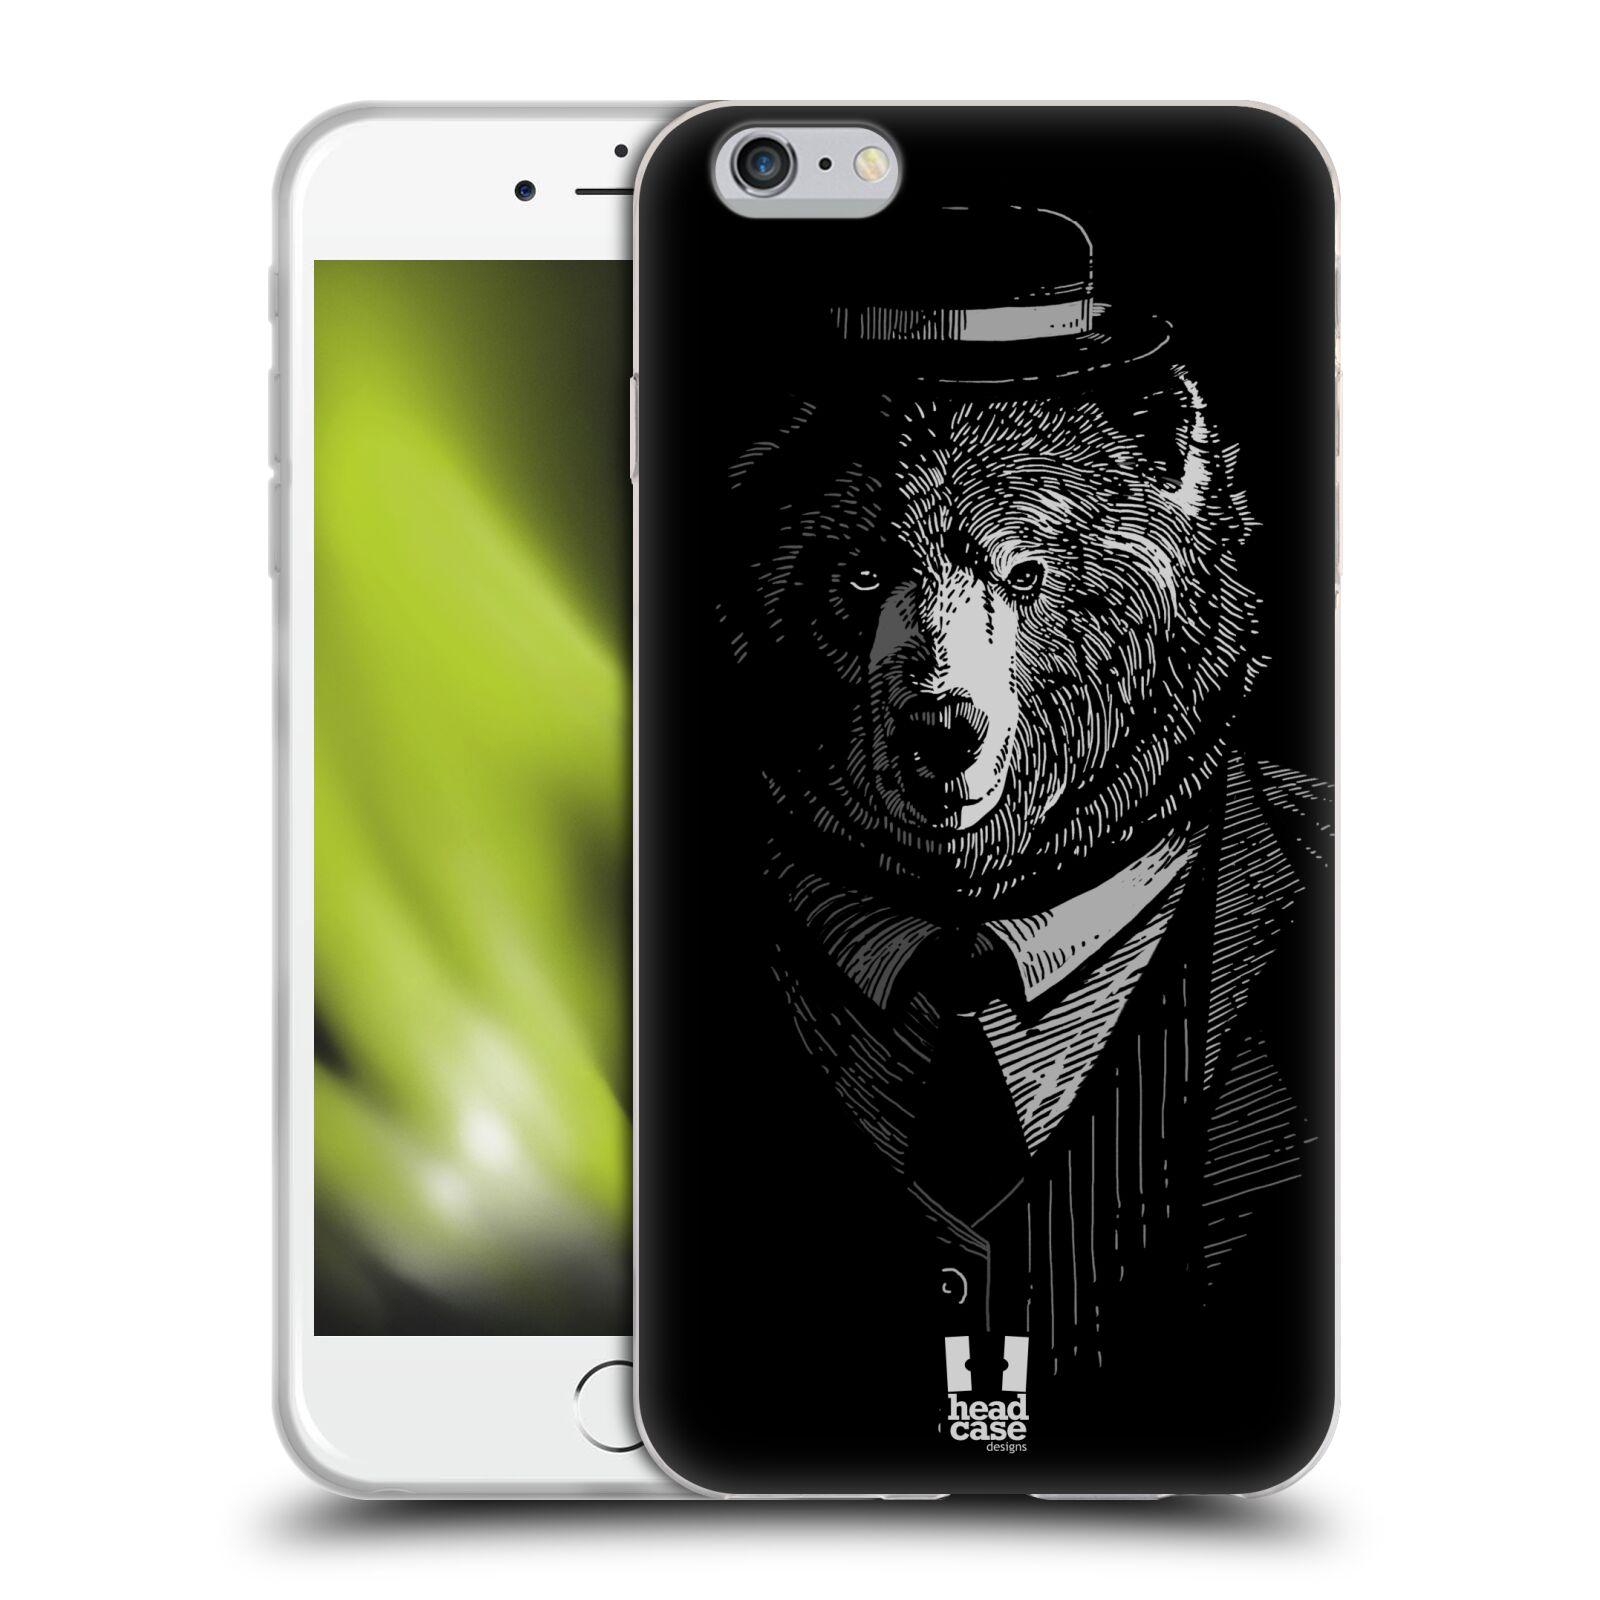 HEAD CASE silikonový obal na mobil Apple Iphone 6 PLUS/ 6S PLUS vzor Zvíře v obleku medvěd